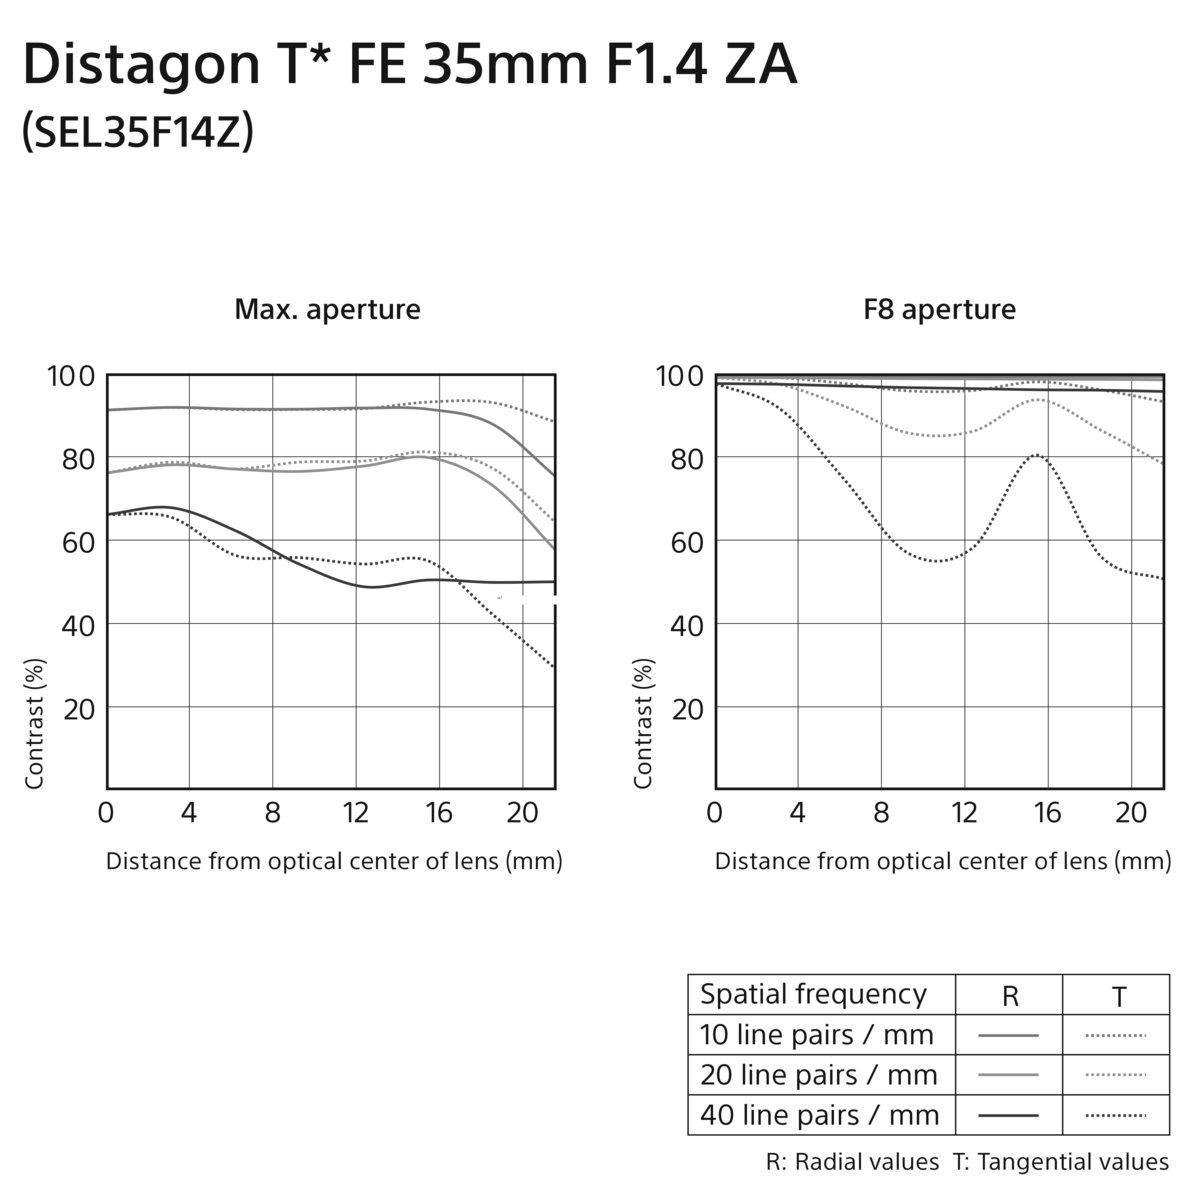 Sony Zeiss Distagon T Fe 35mm F 14 Za Full Frame E Mount Nex Lens Camera Sel35f14z